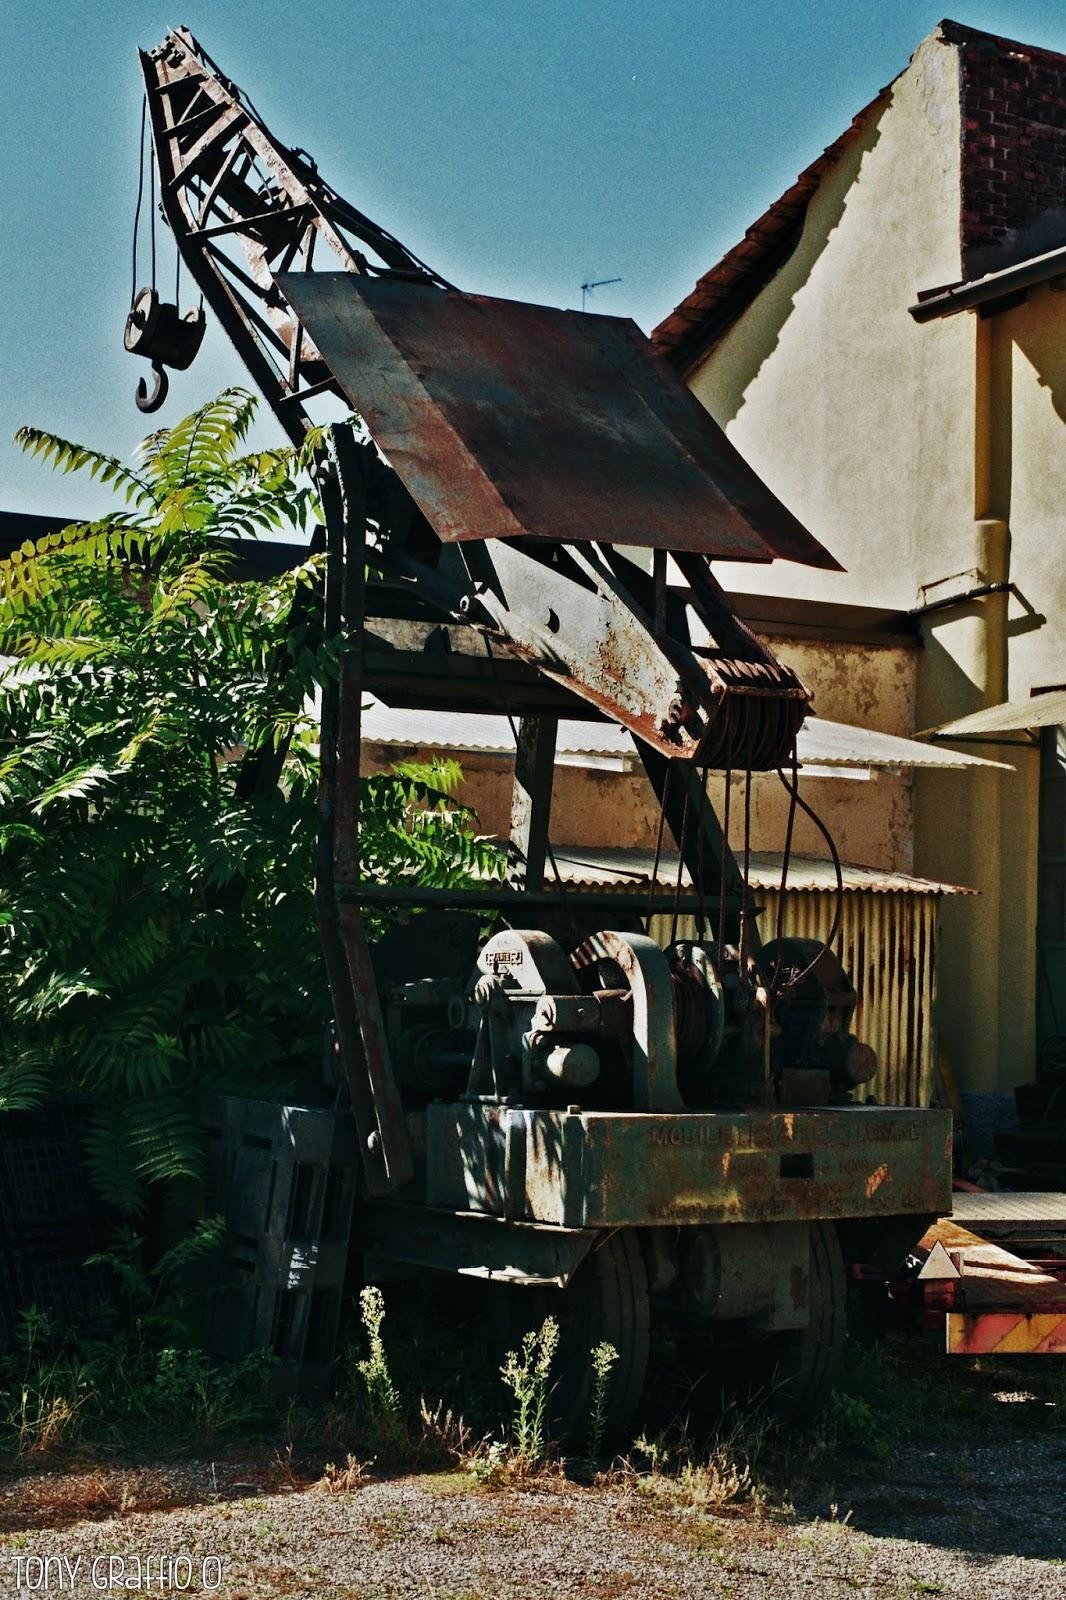 A Dergano ricompare una Ransomes & Rapier 6 ton diesel-electric crane (Kevin)